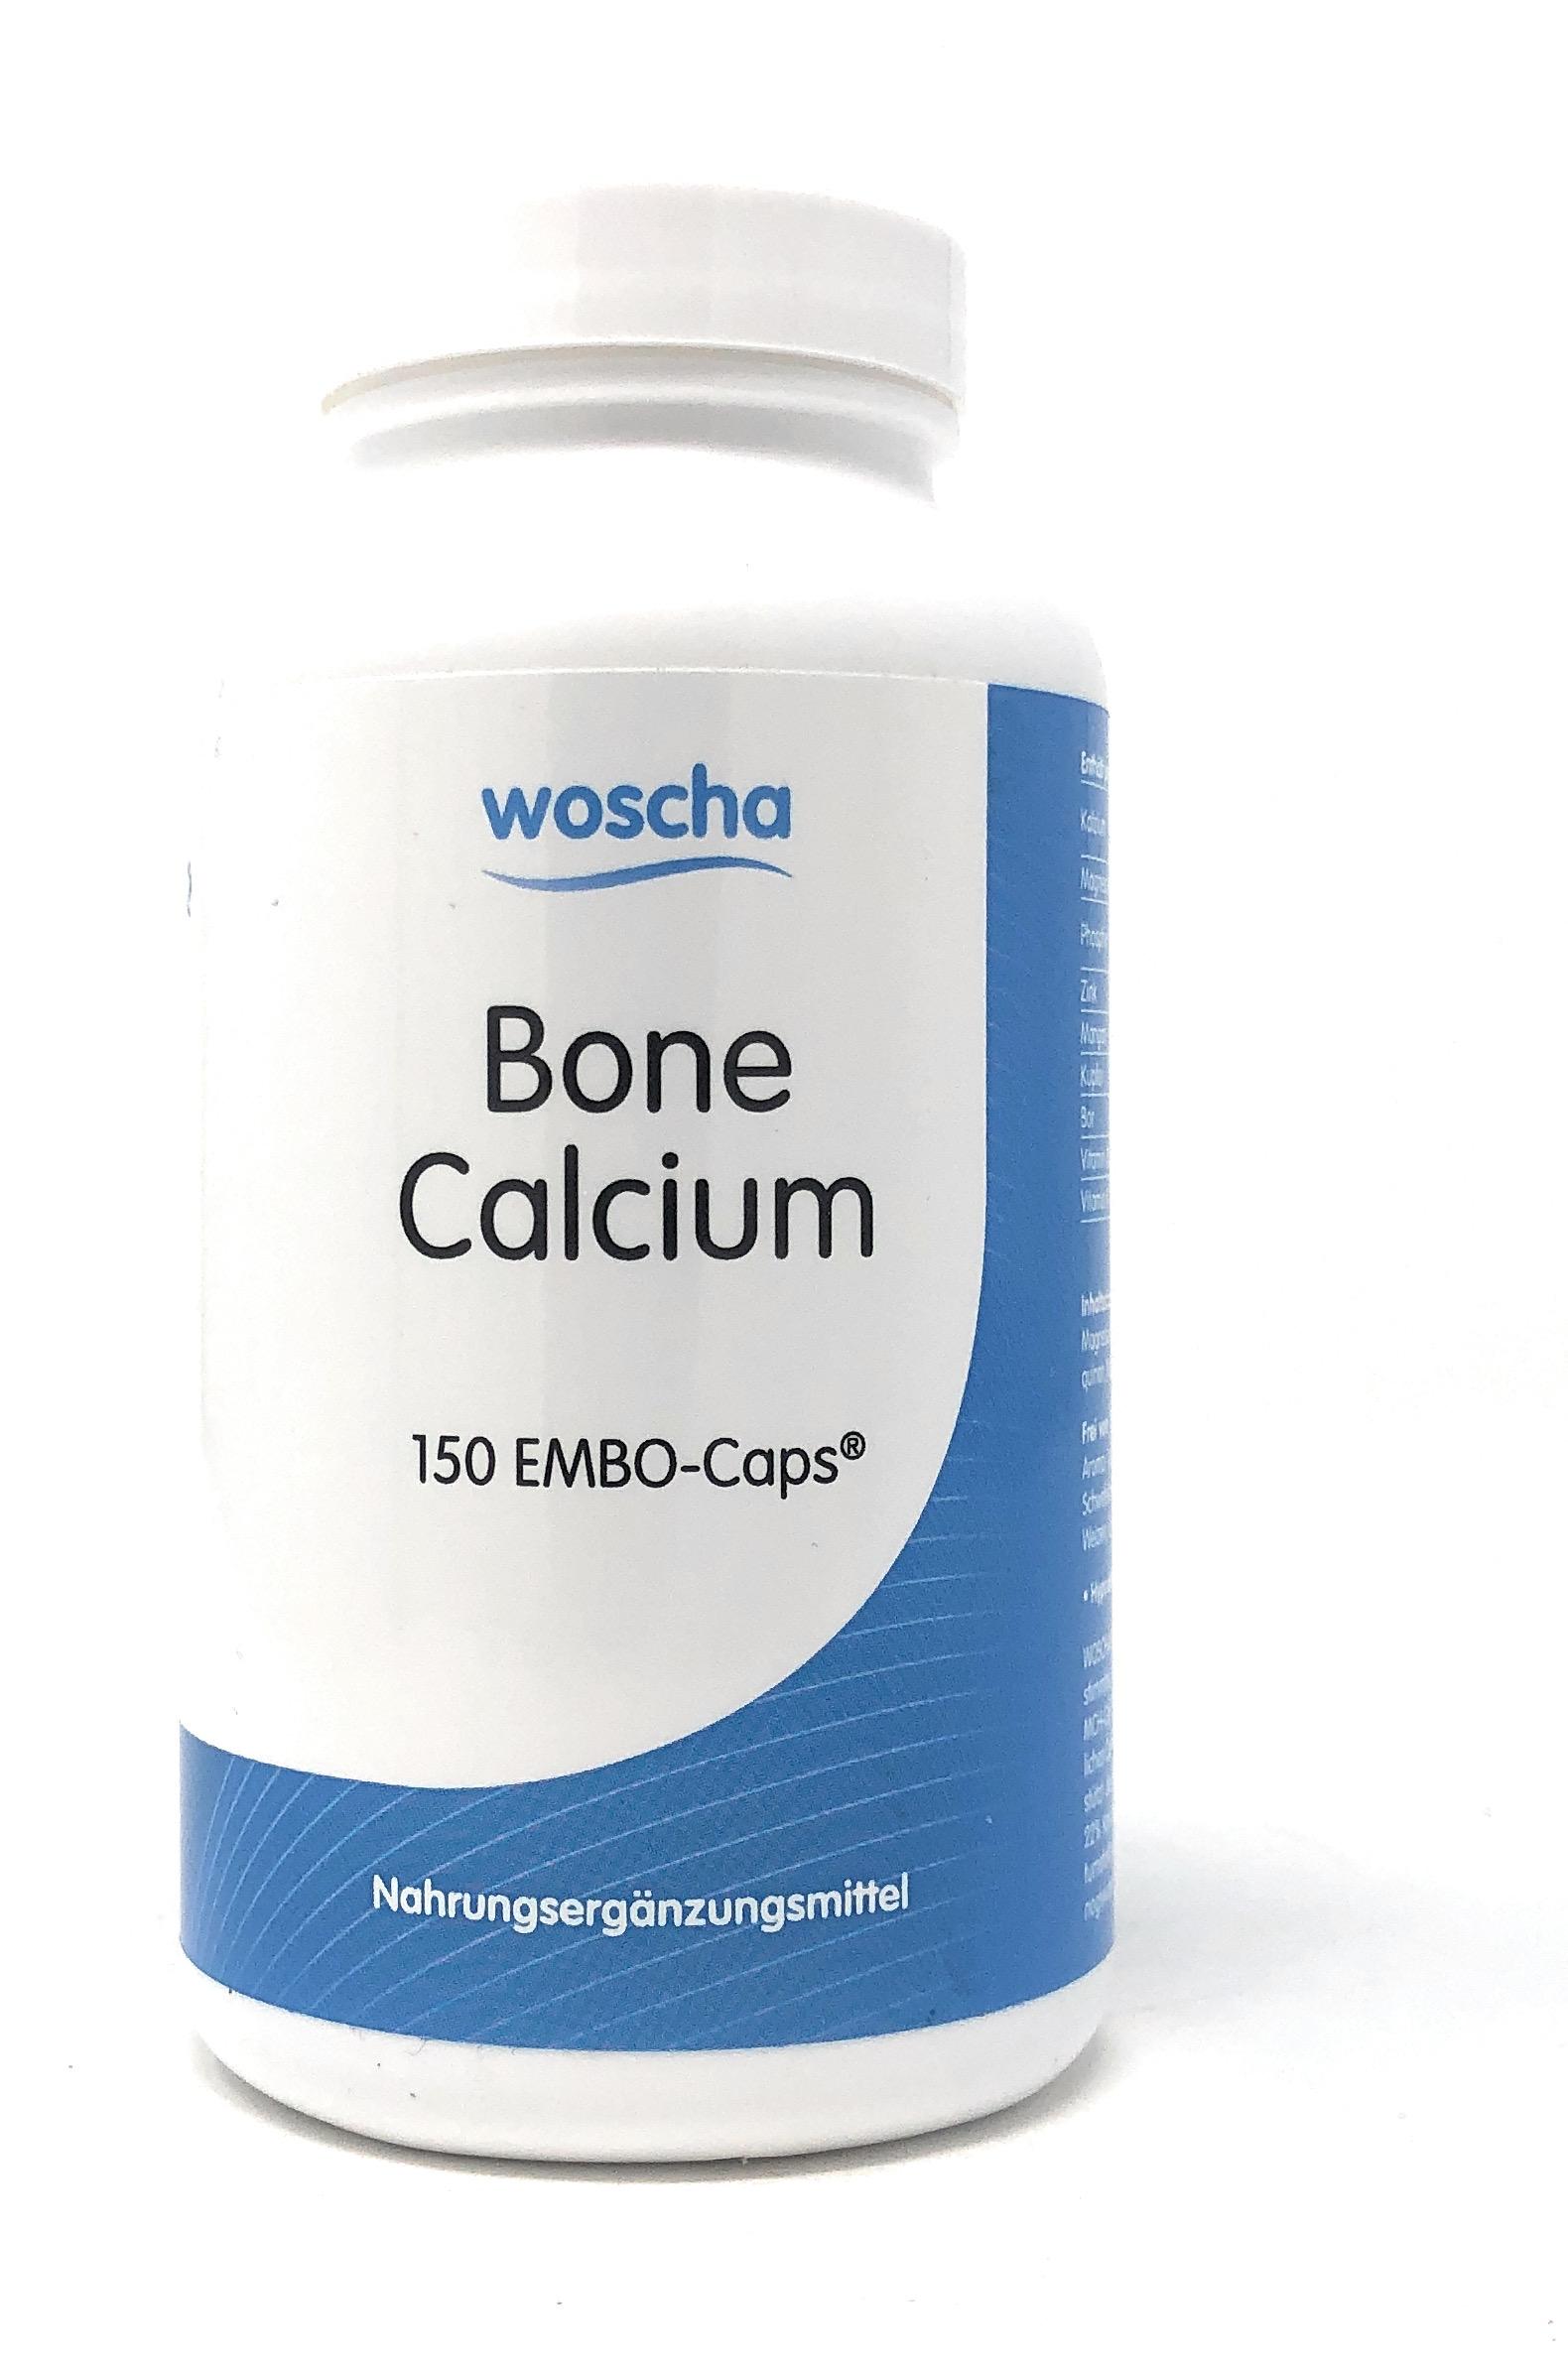 woscha Bone Calcium 150 Embo-CAPS® (149g)